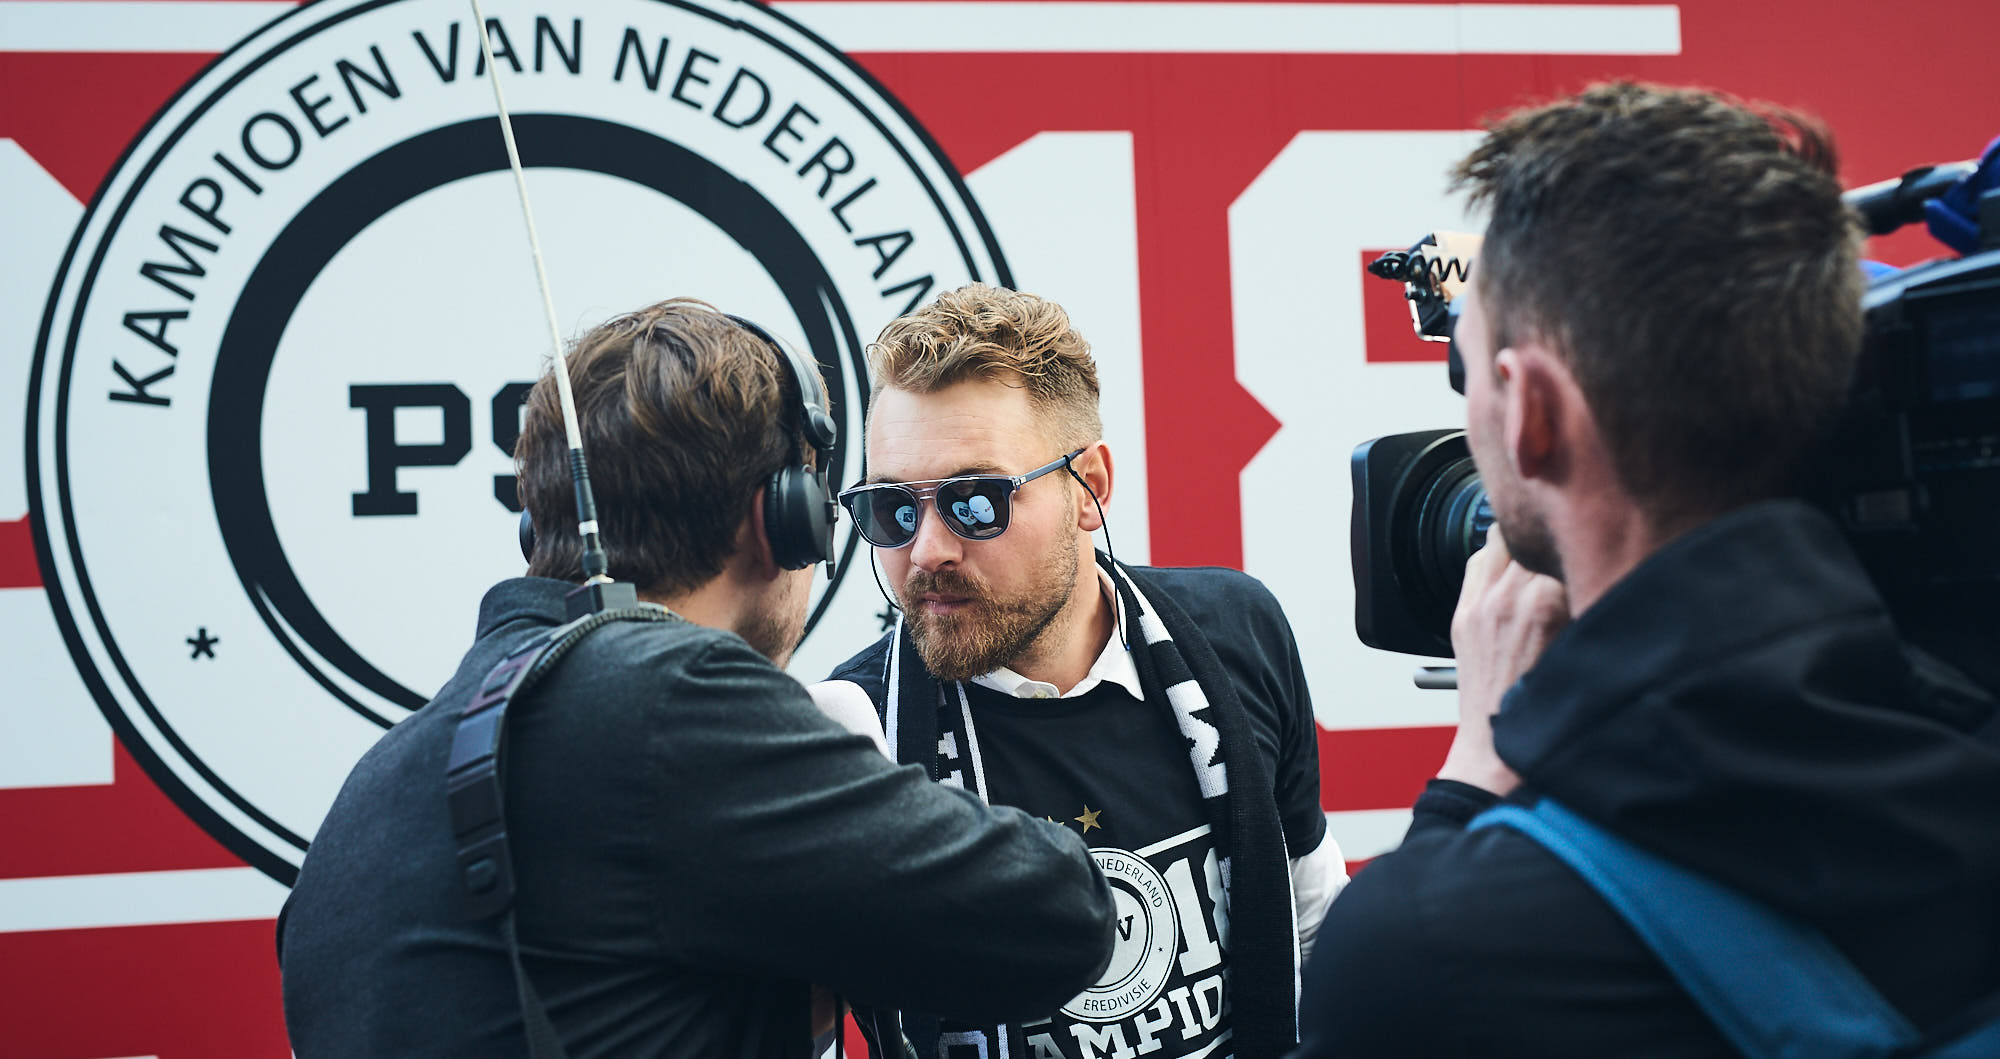 PSV Eindhoven goalkeeper Jeroen Zoet during an interview